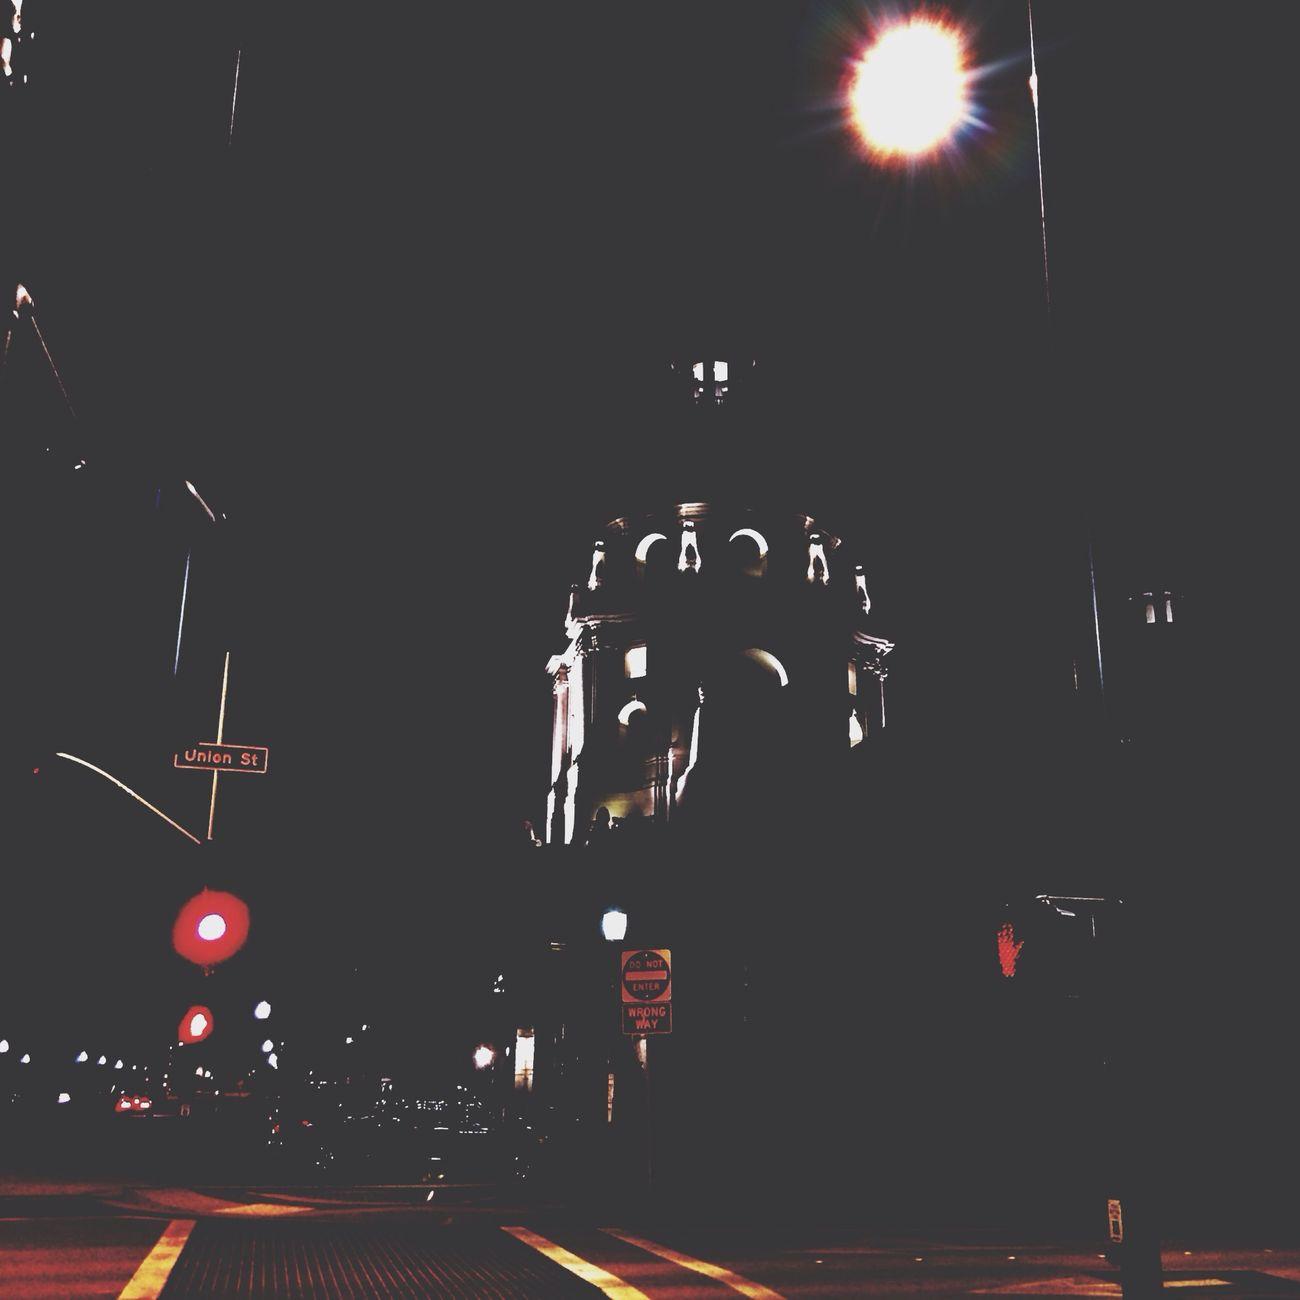 Walking home..